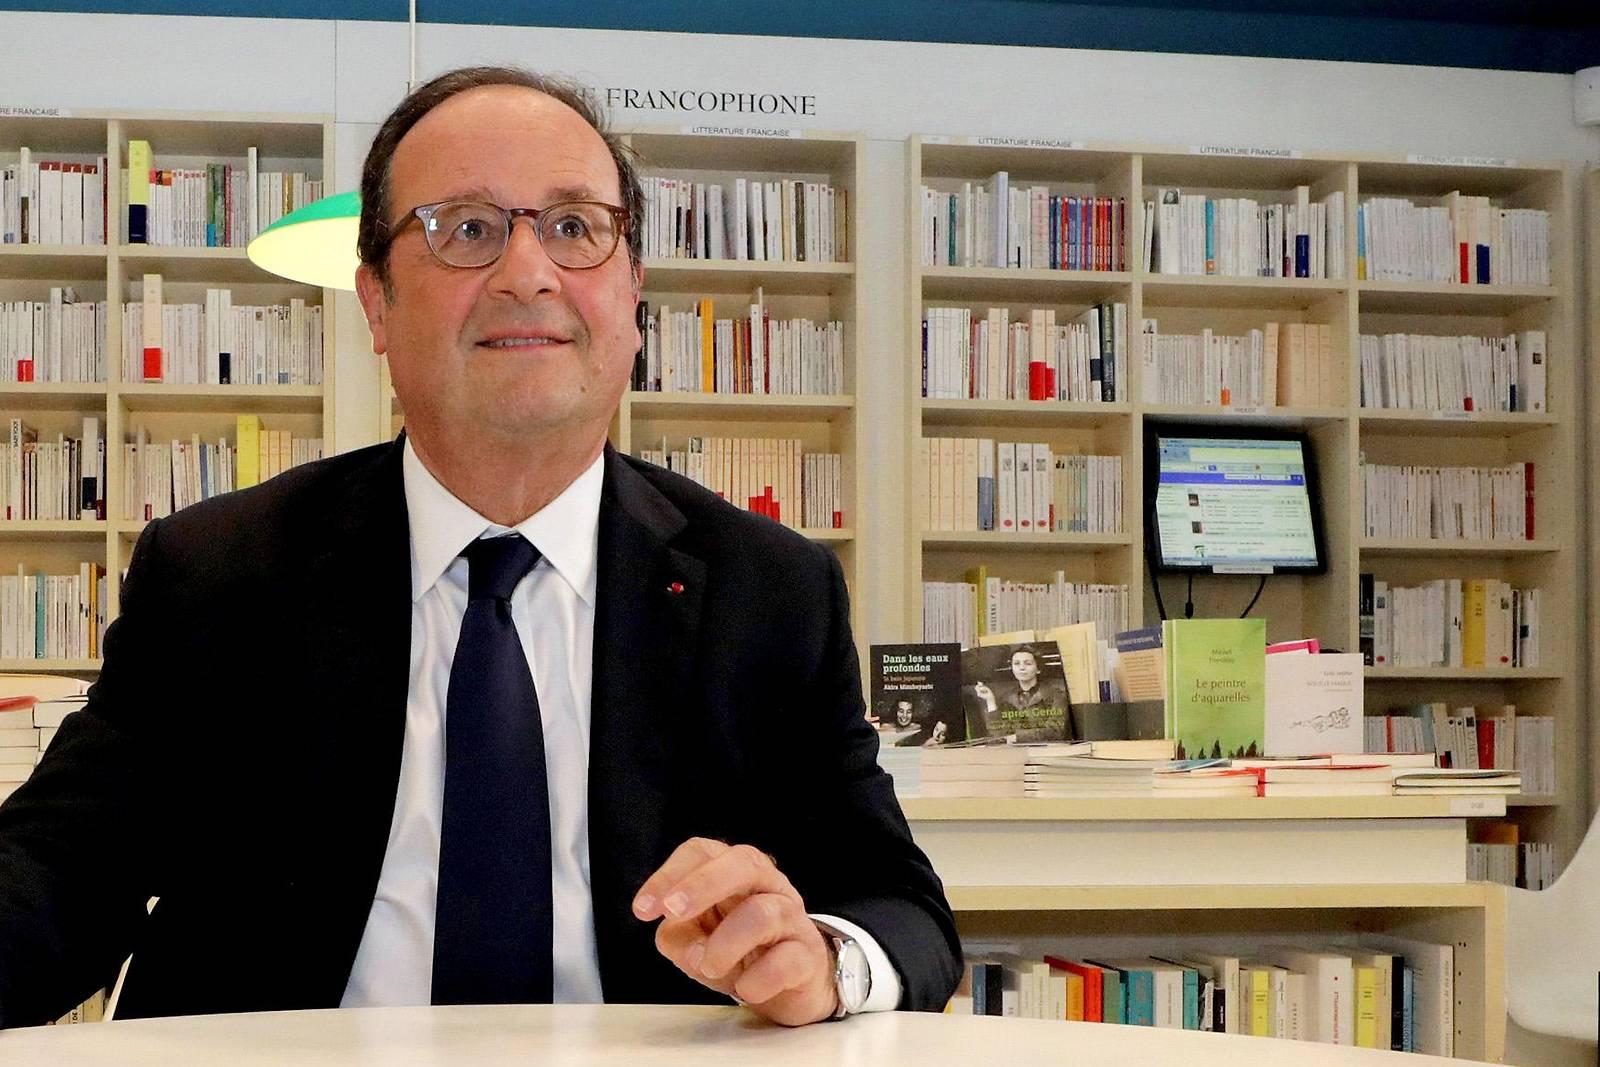 Francois Hollande kündigt politisches Comeback an